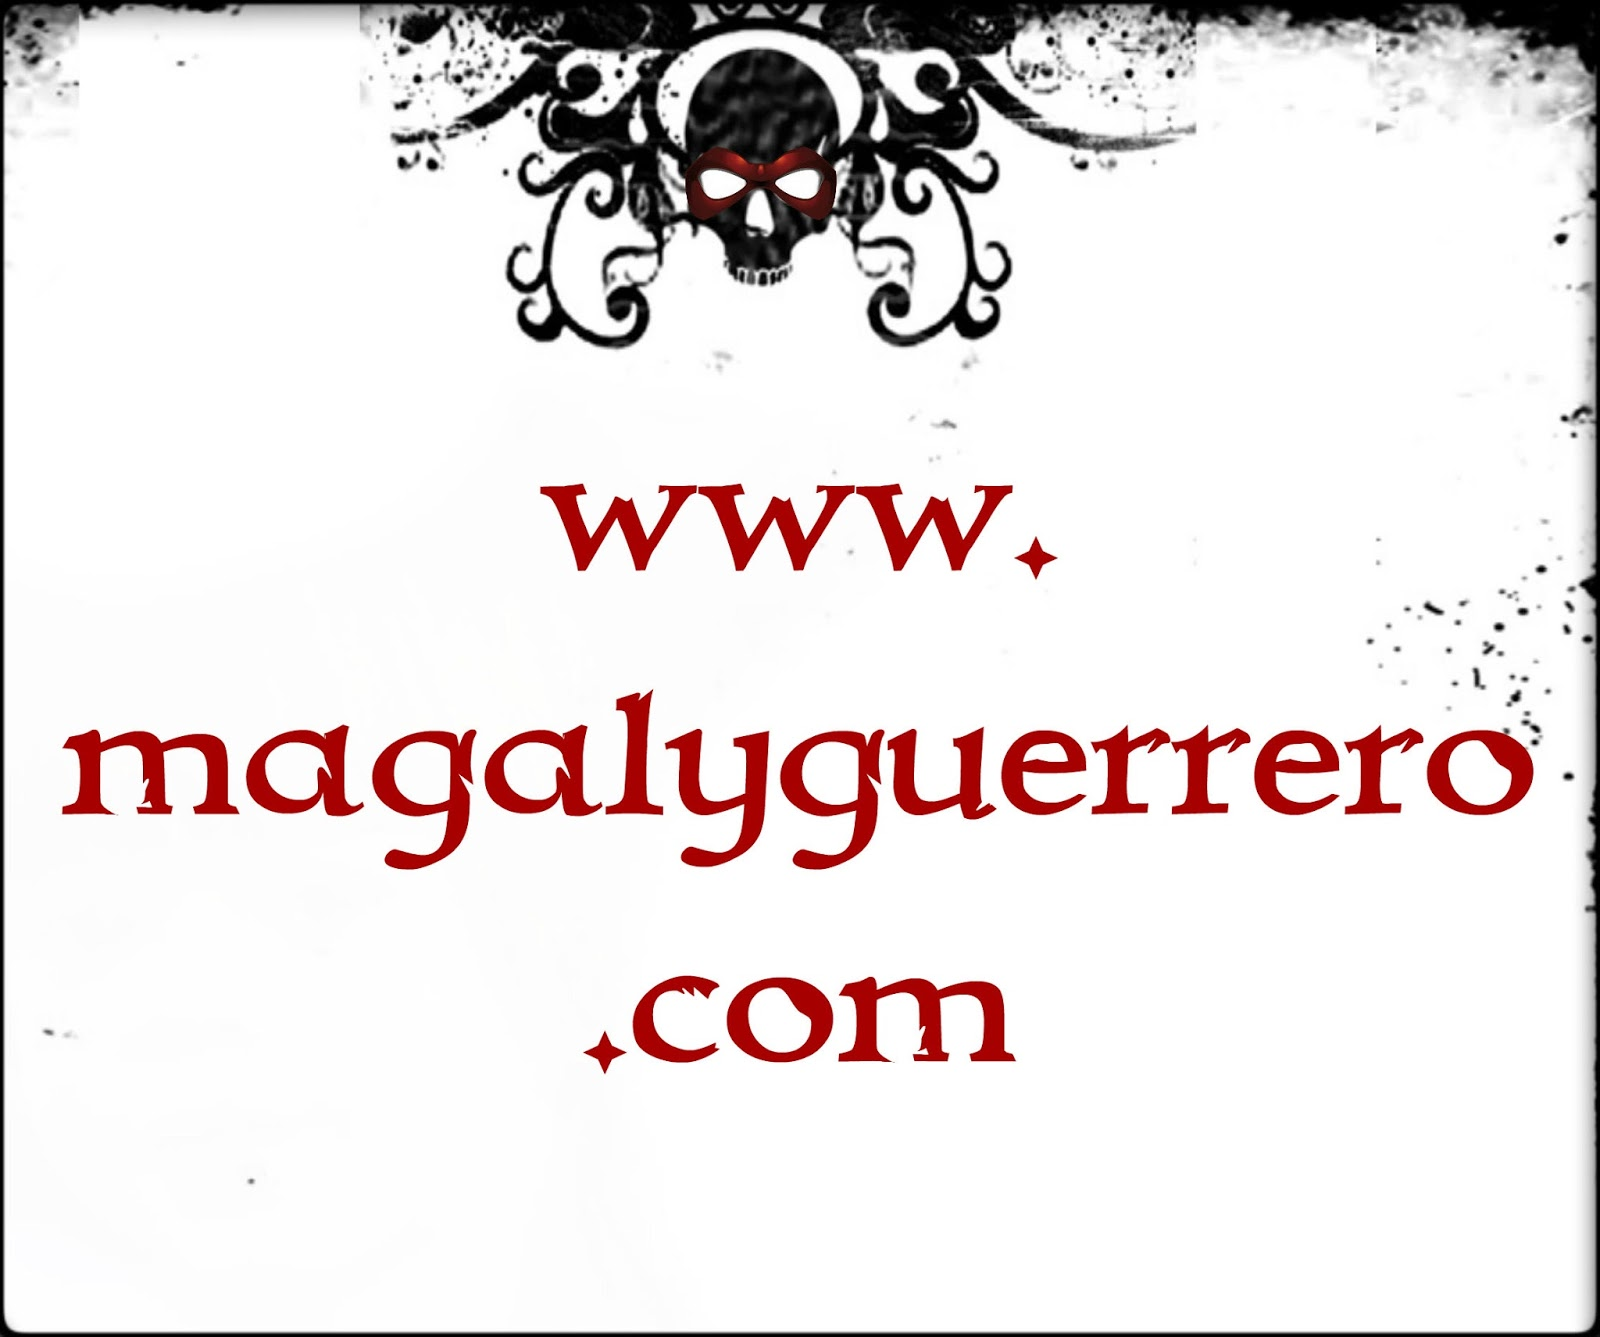 http://magalyguerrero.com/